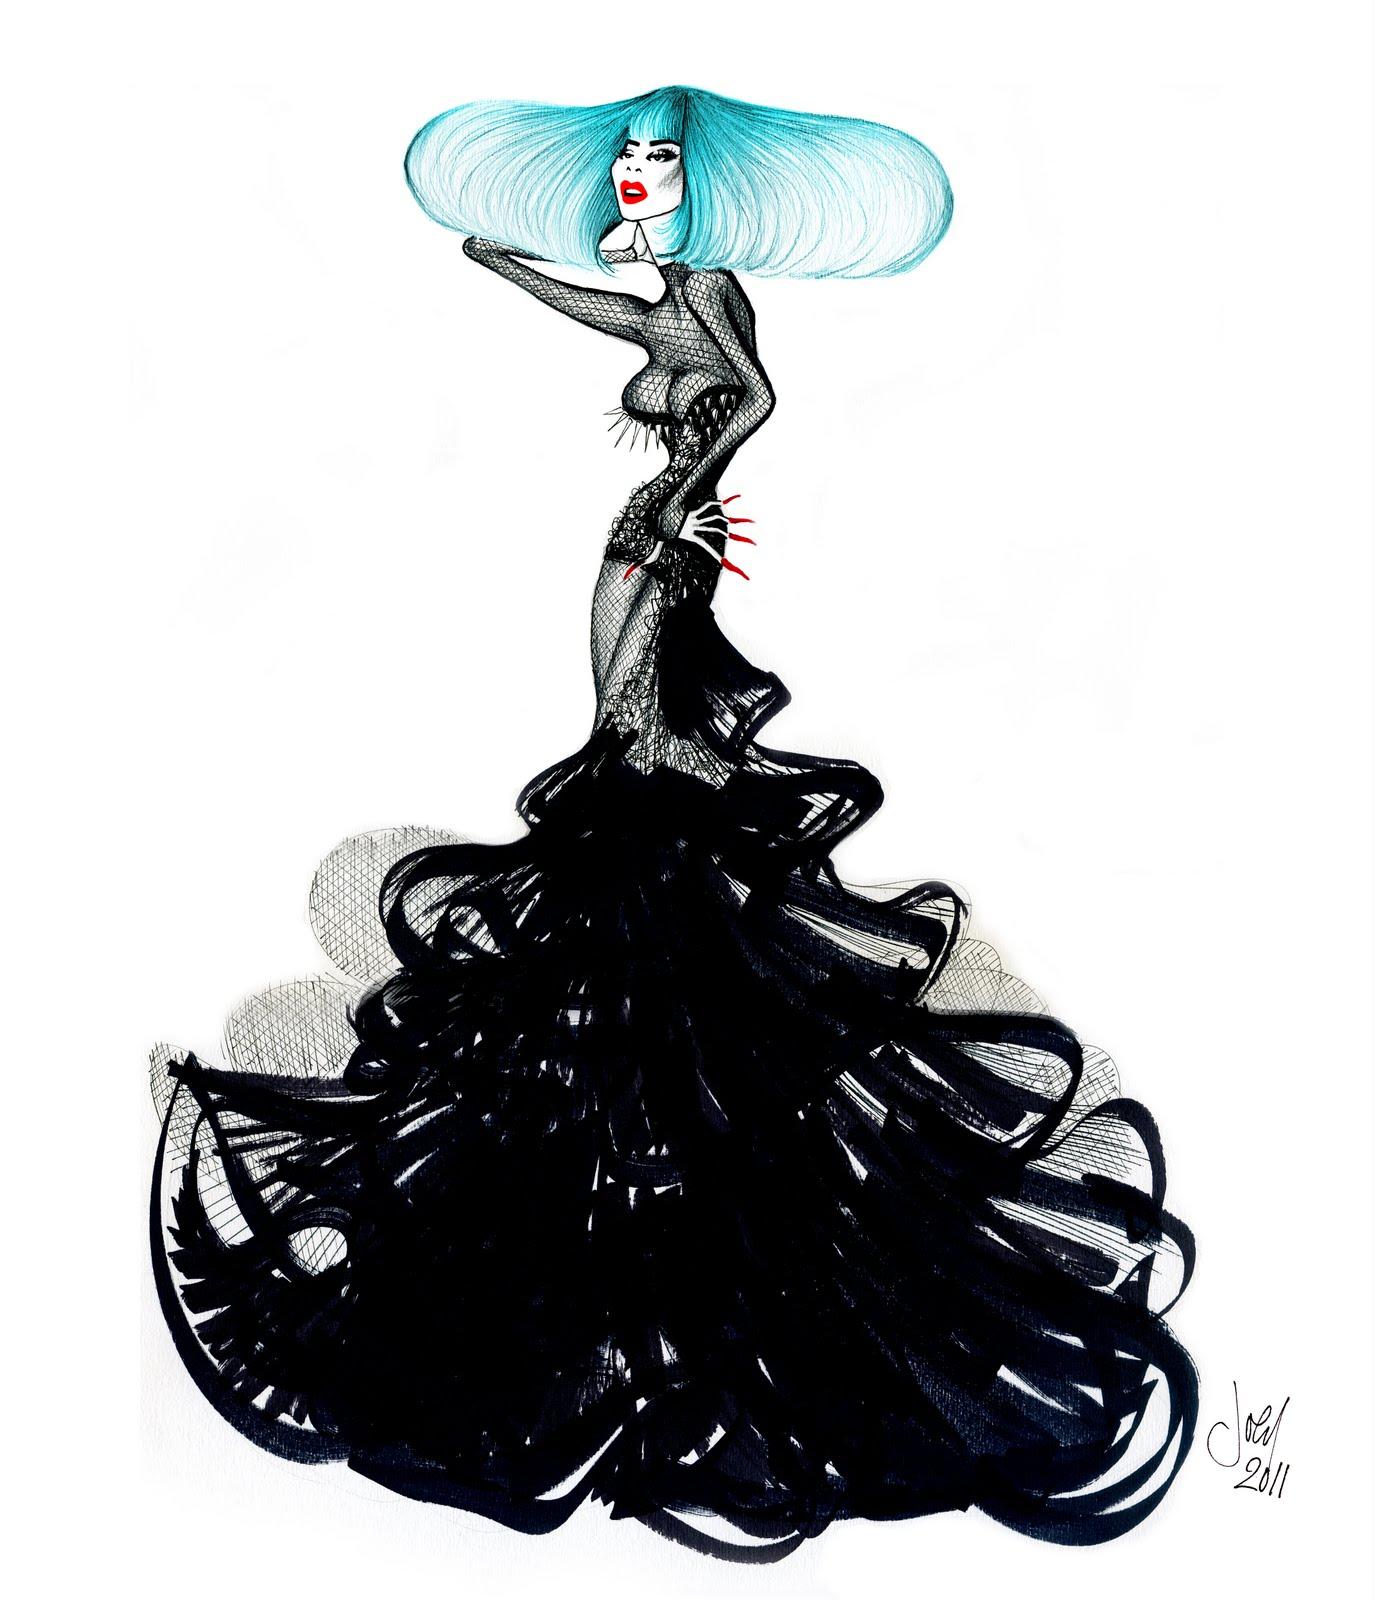 http://4.bp.blogspot.com/-E6UPTSgwXg8/TiSVJgIn5rI/AAAAAAAAAlw/glULJowHQ-g/s1600/1.+V-Magazine_Lady+GAGA%2540+CFDA+Fashion+Awards+2011+by+AtelierJoeyHolthaus+72+dpi.jpg